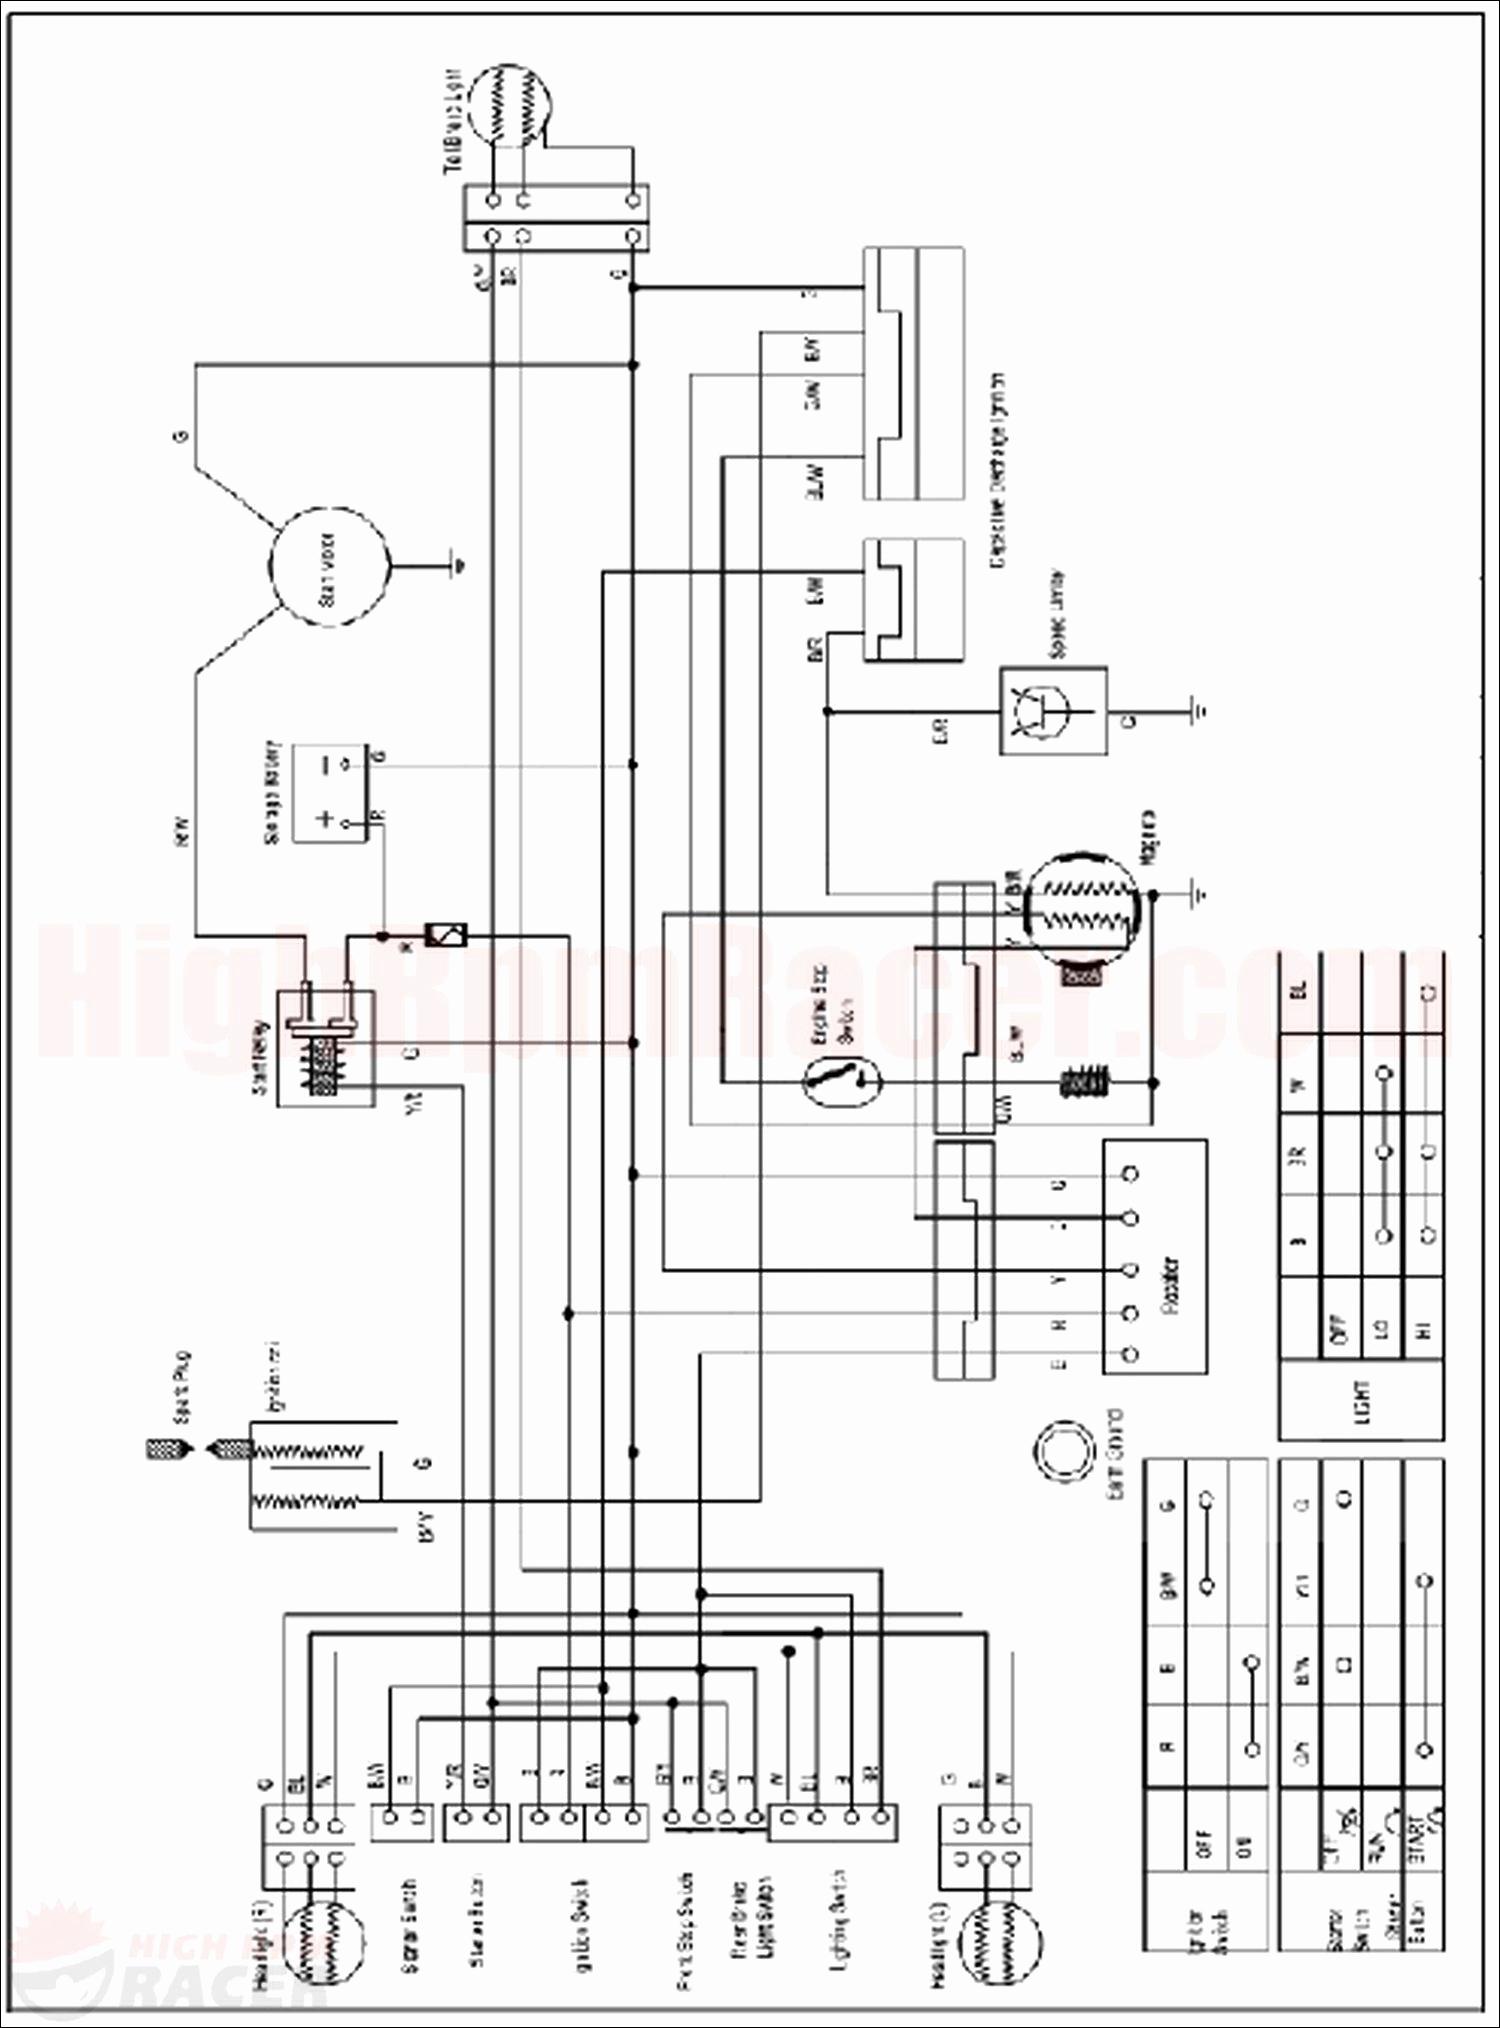 Wiring Diagram Suzuki Gsxr 2008 – Simple Wiring Diagram - Chinese 125Cc Atv Wiring Diagram